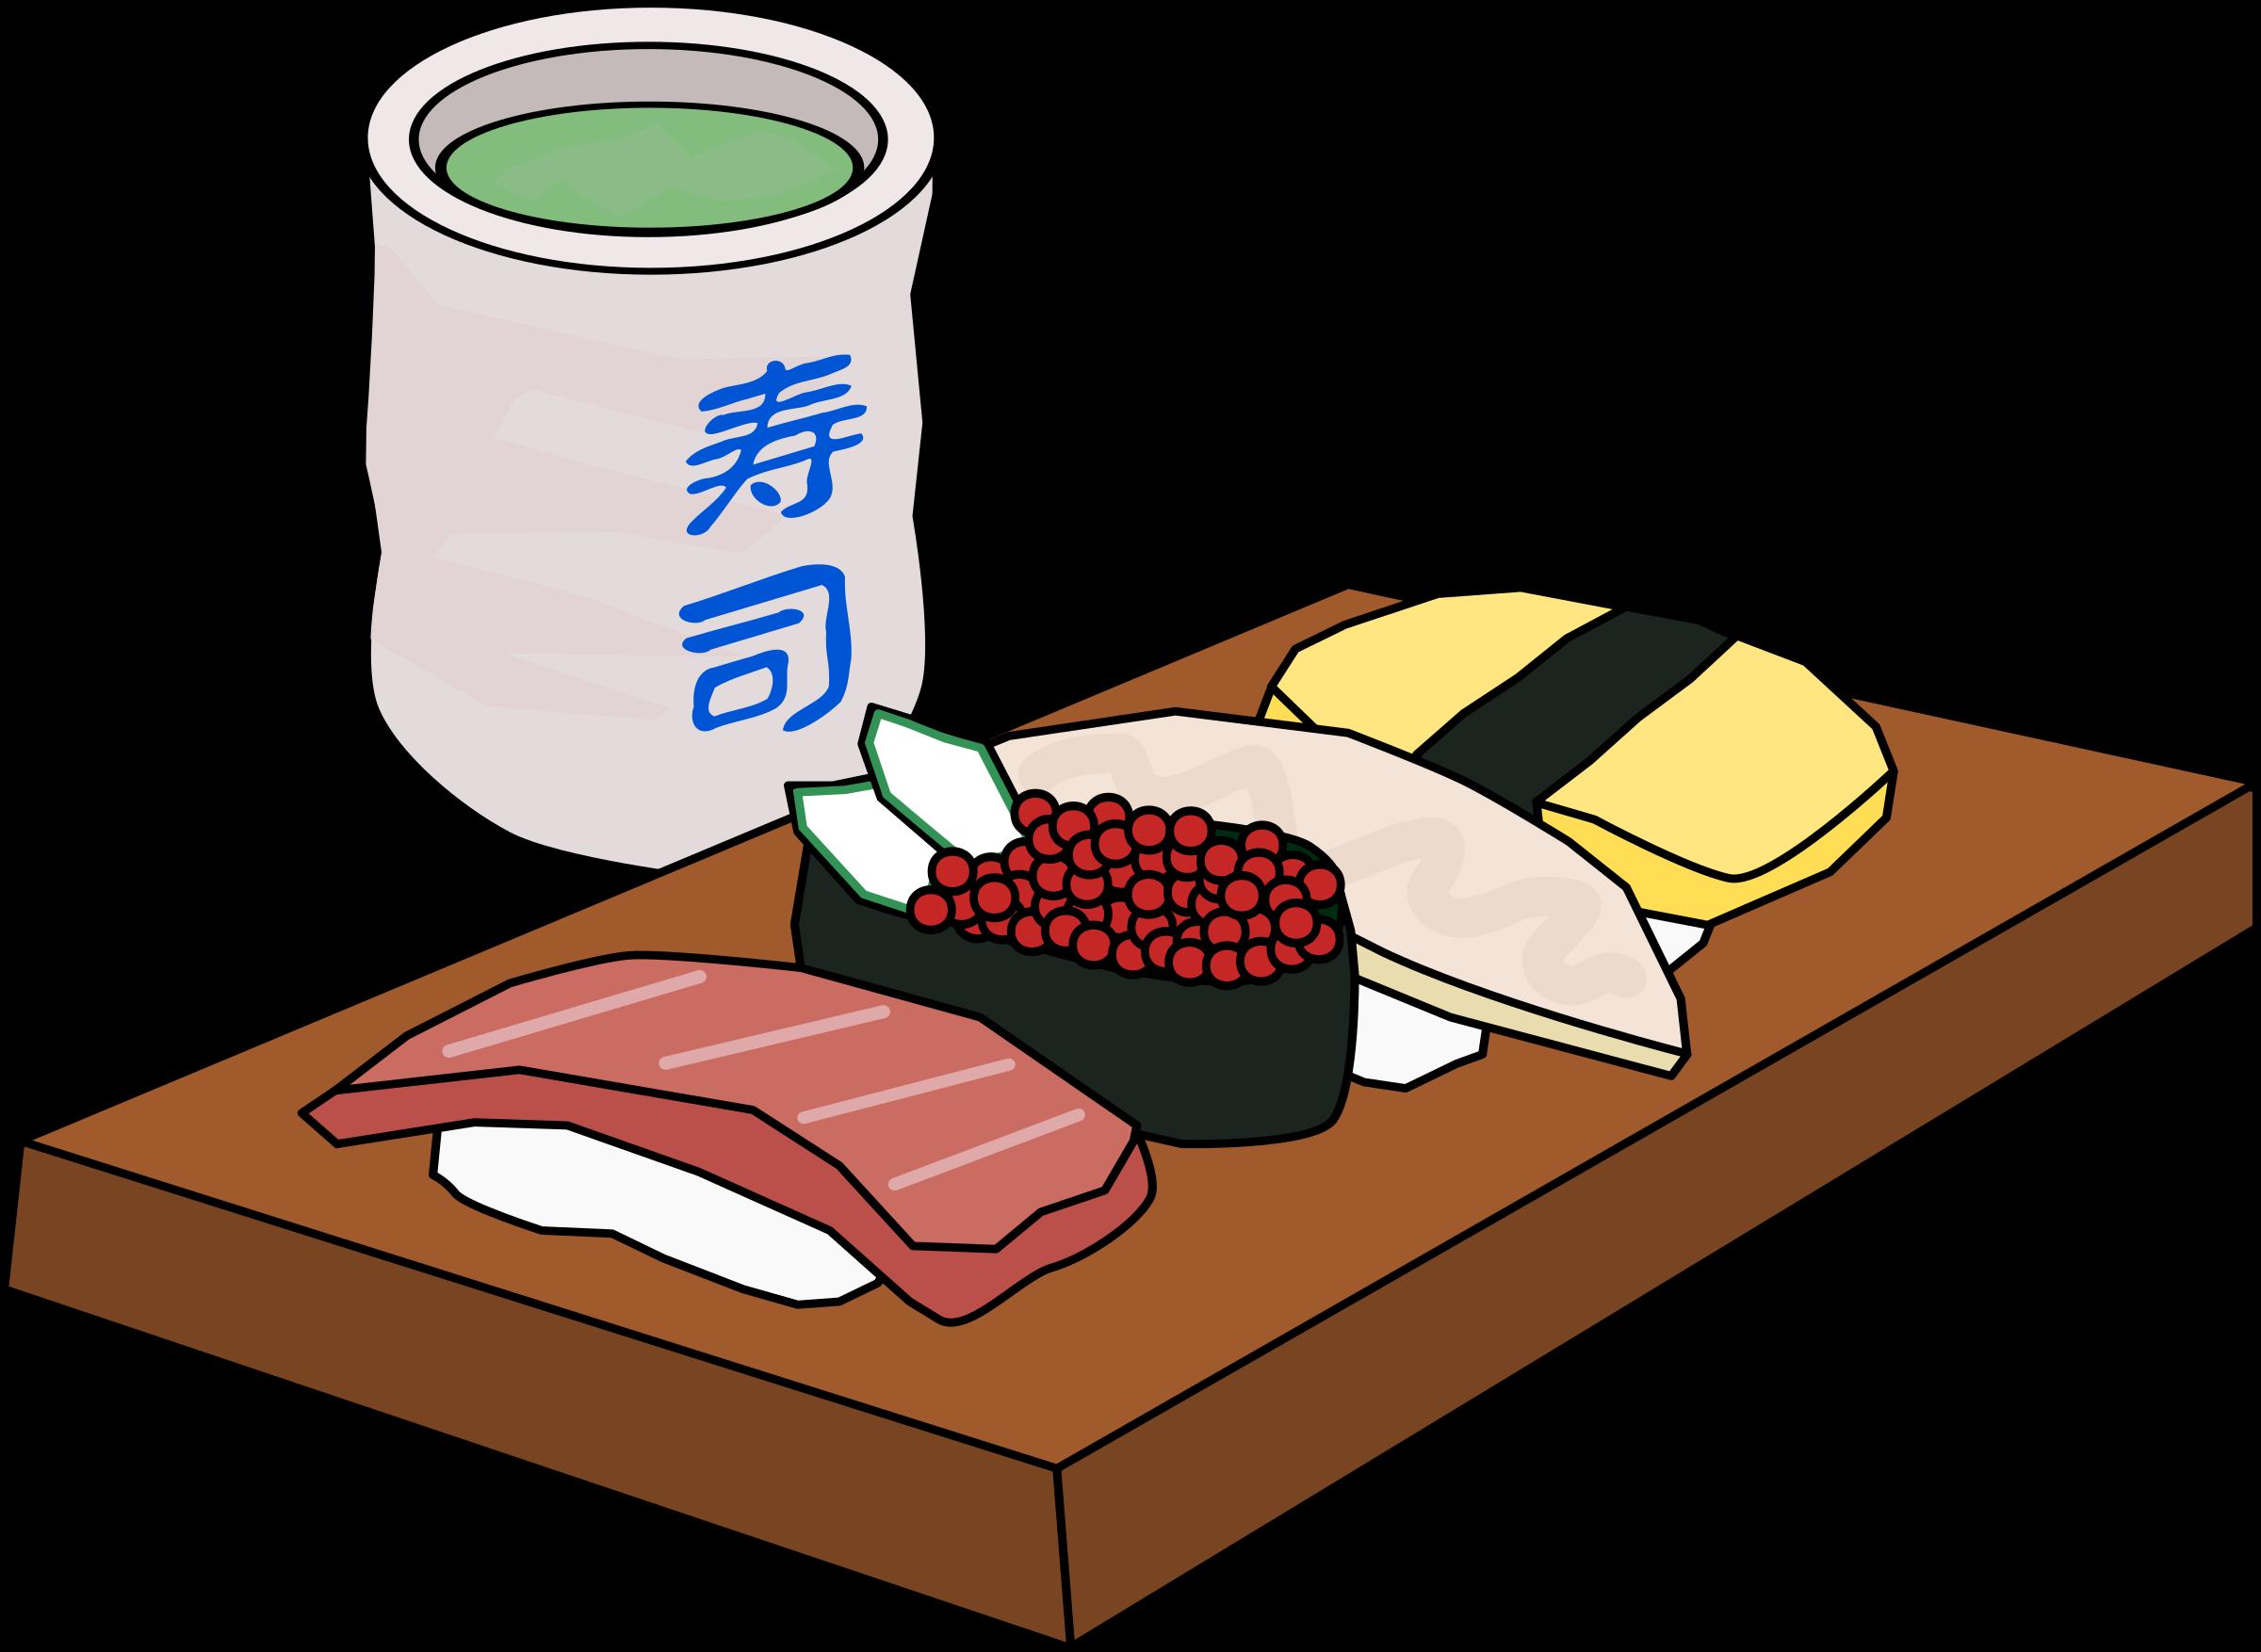 Sushi cartoon with gift. Tea clipart social